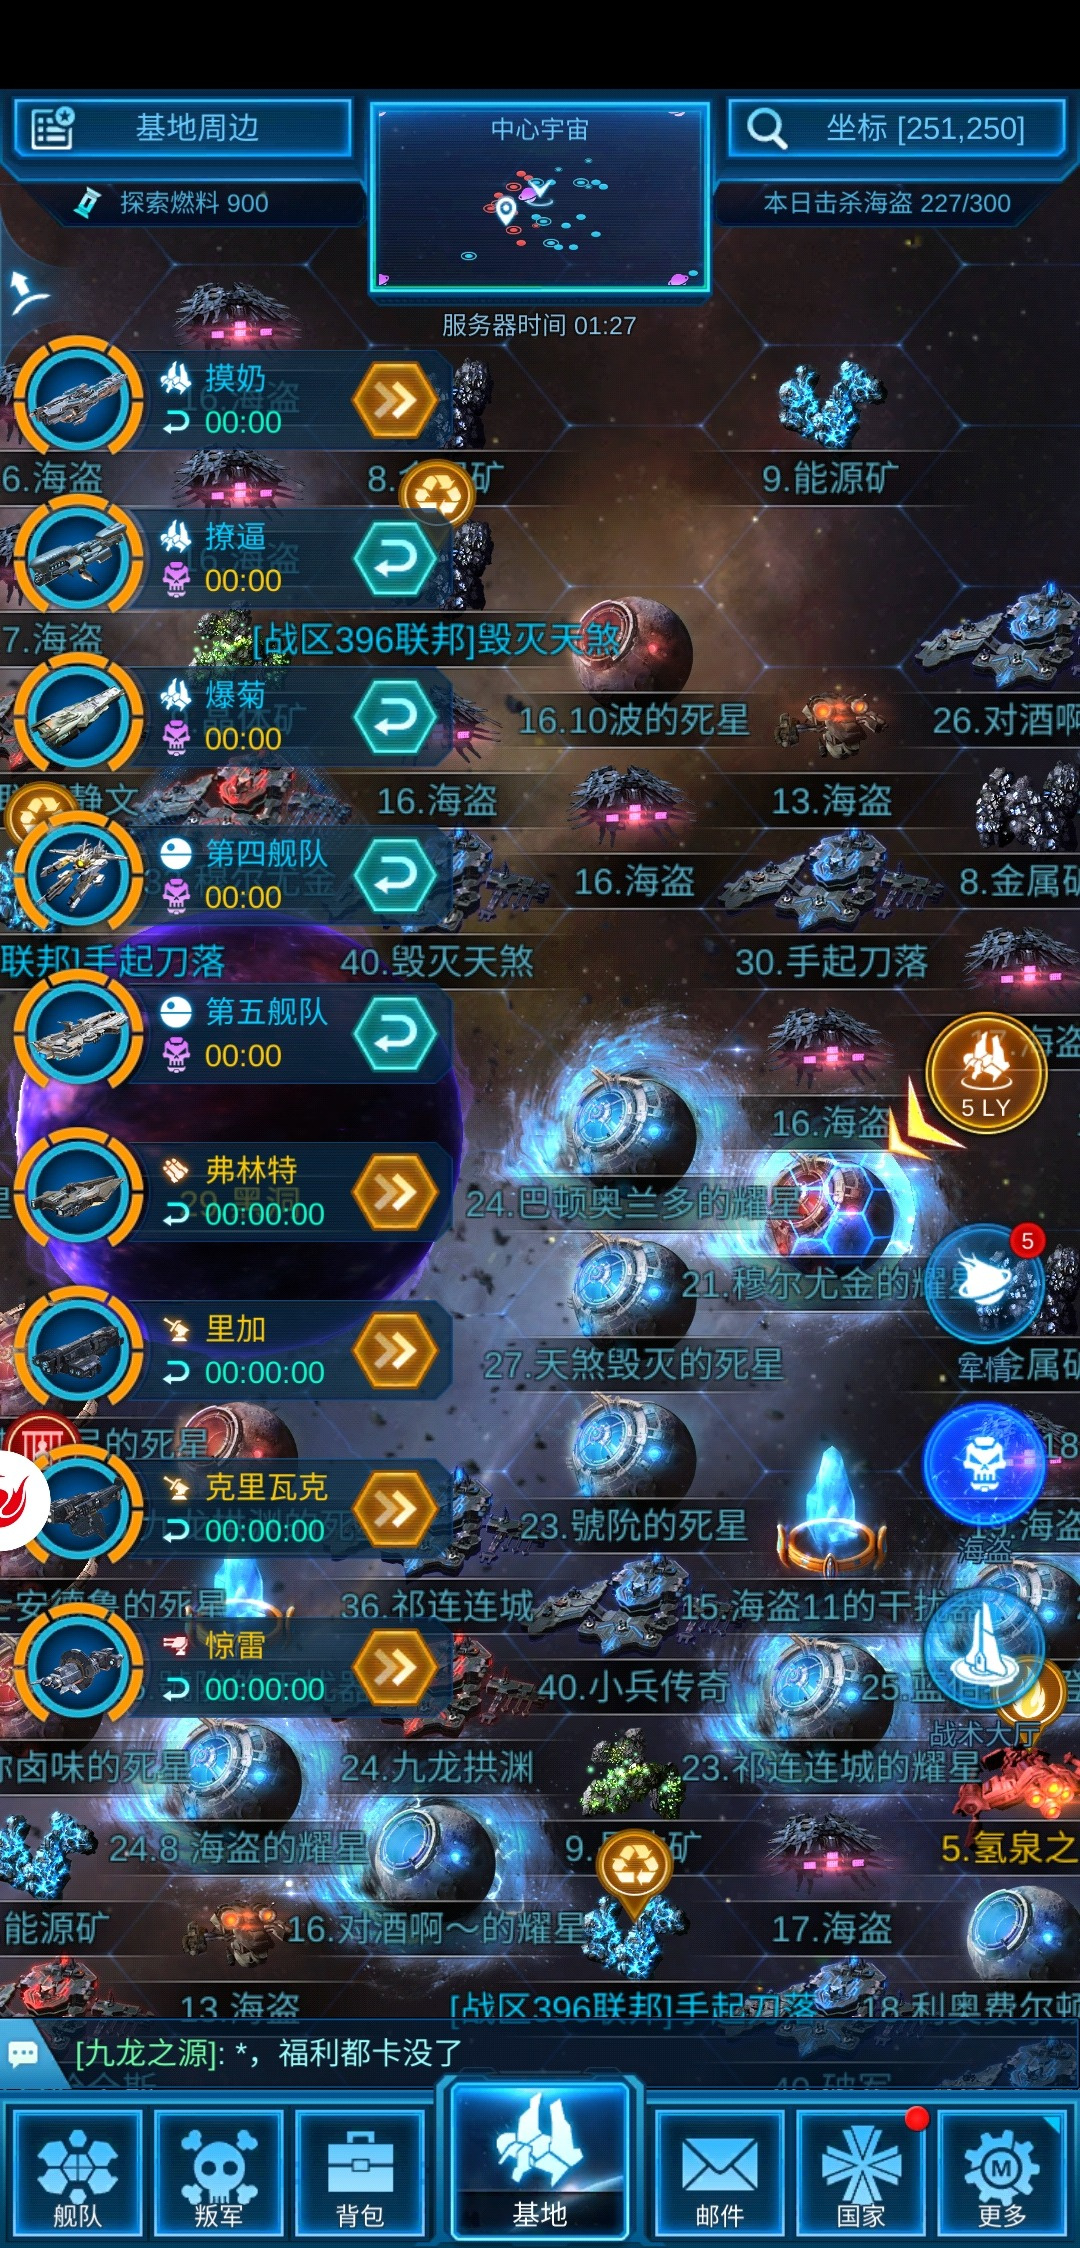 Screenshot_2020-03-06-01-27-28-351_com.jedigames.p16s.luobo.jpg